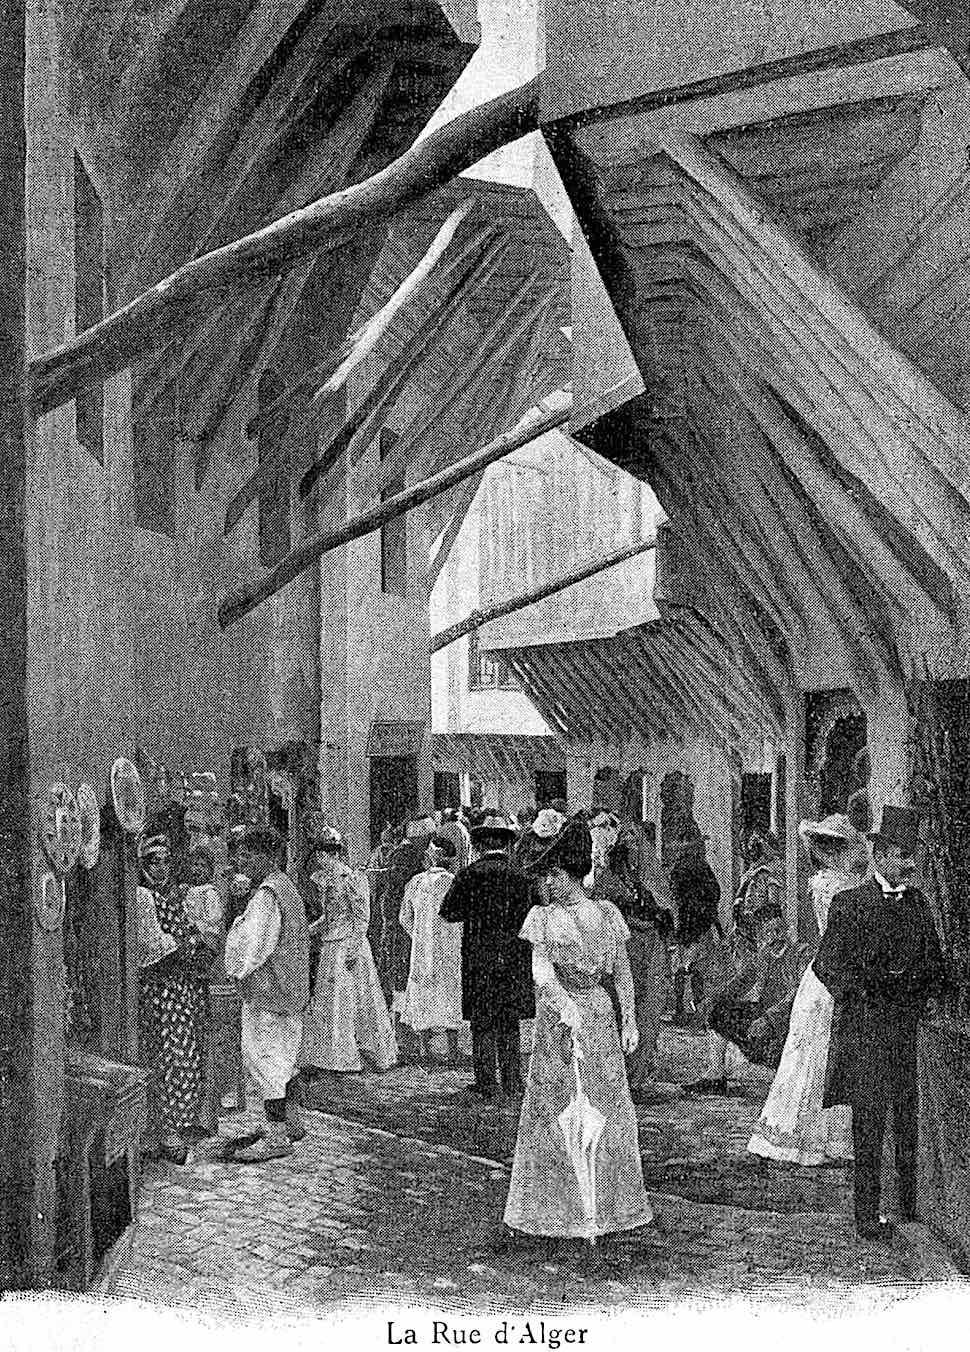 The Rue d 'Alger at the 1900 Paris World's Fair, an illustration